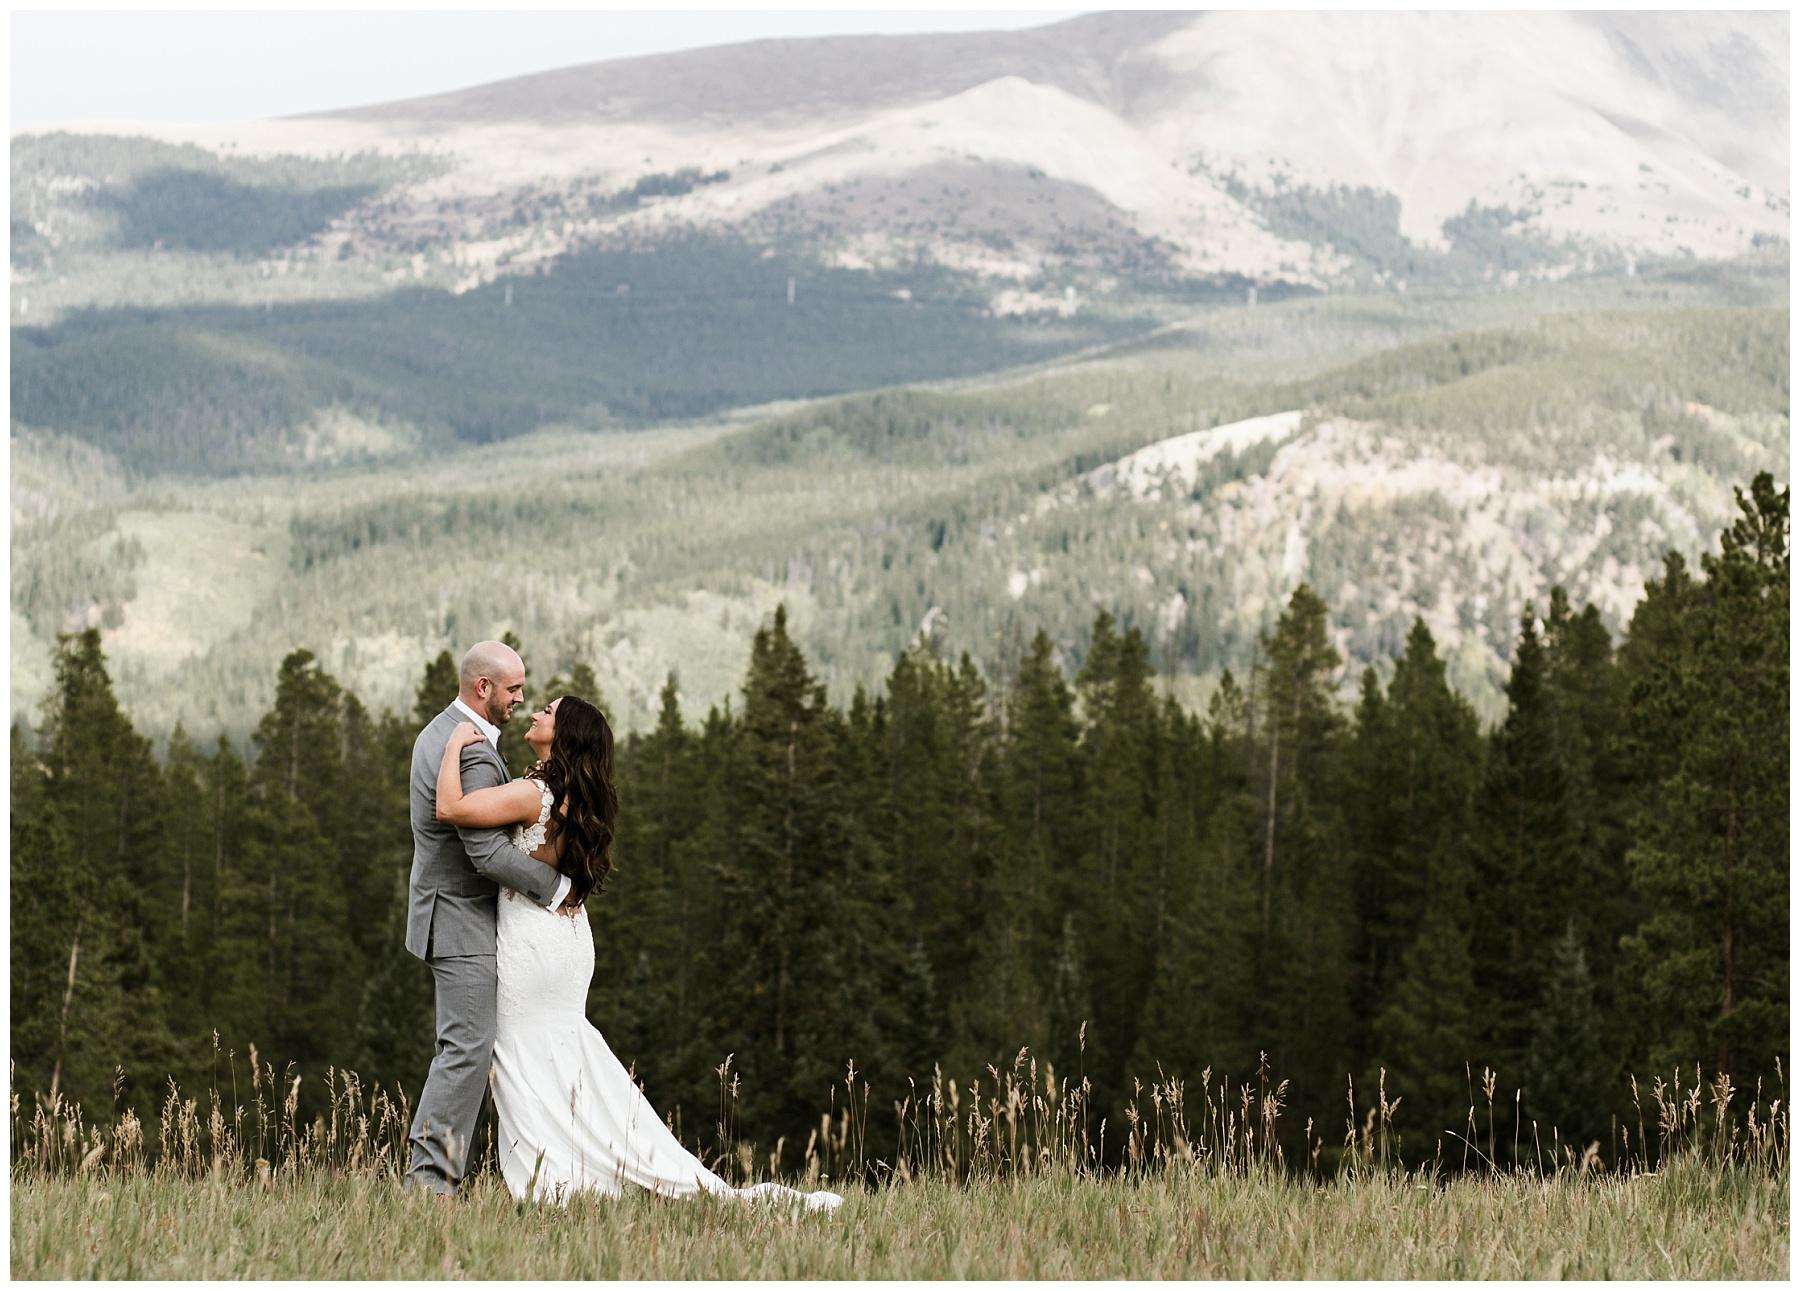 Katesalleyphotography-183_married in Breckenridge.jpg